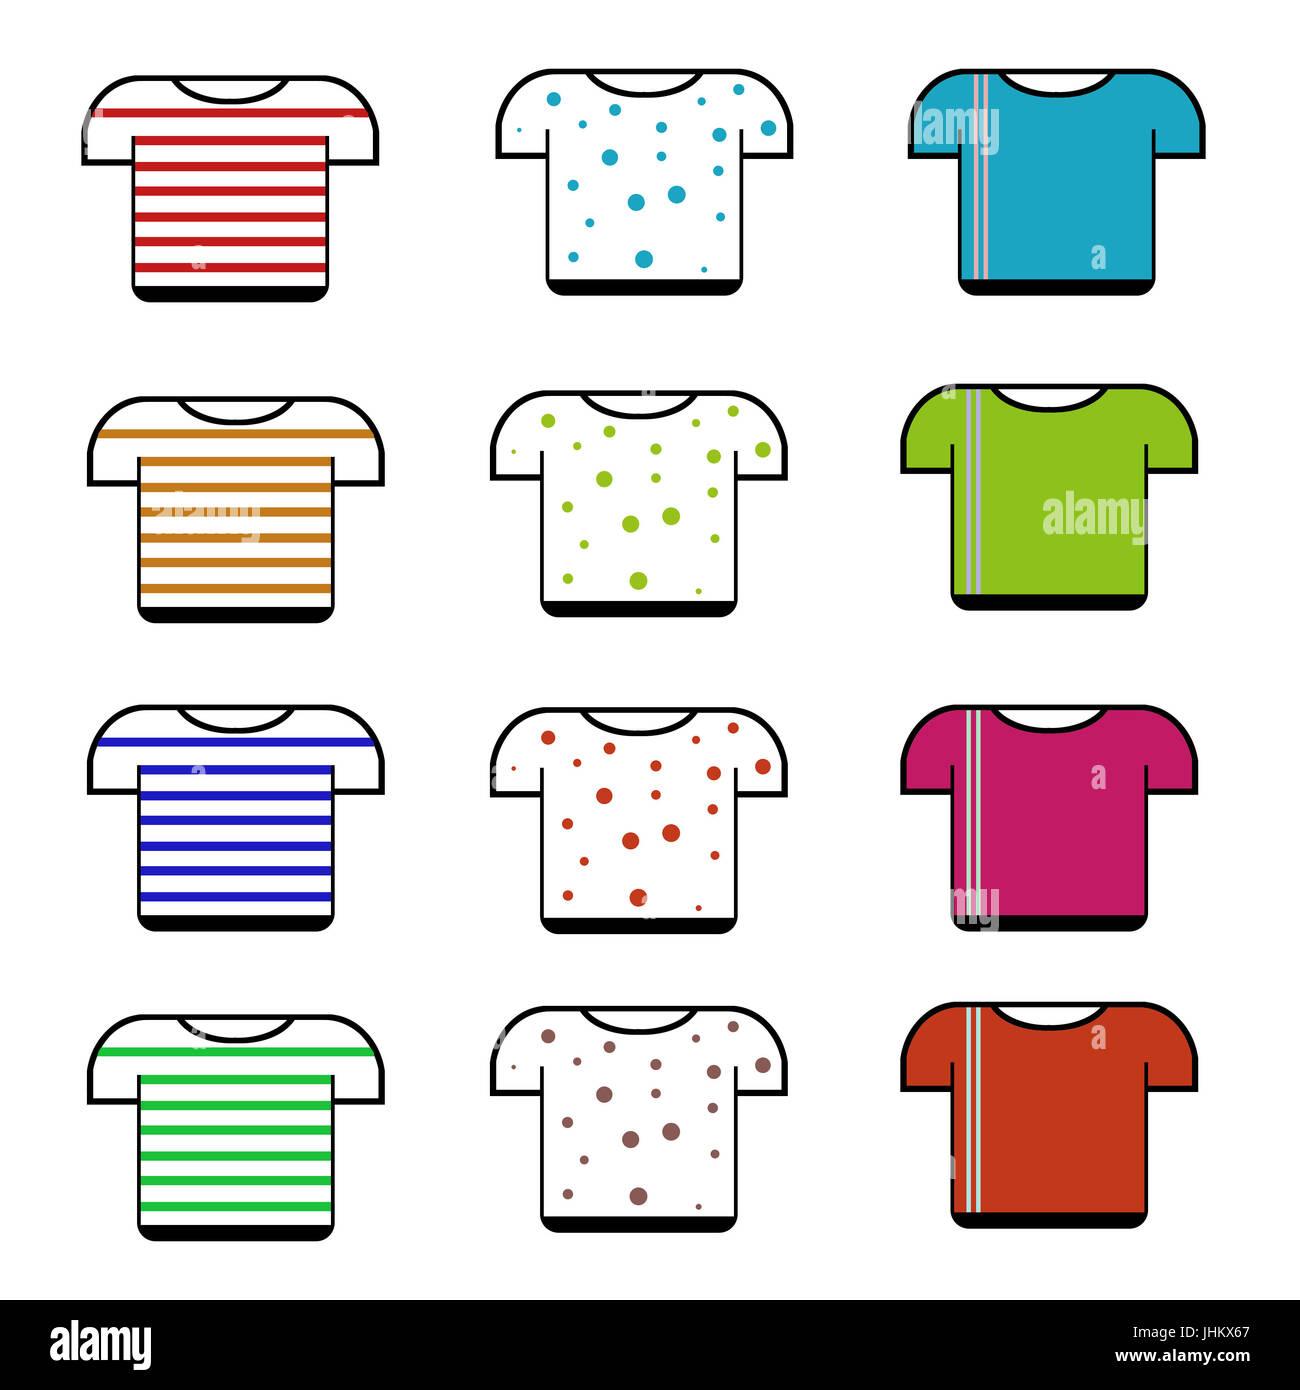 t-shirt clip art,isolate t-shirt on white background - Stock Image